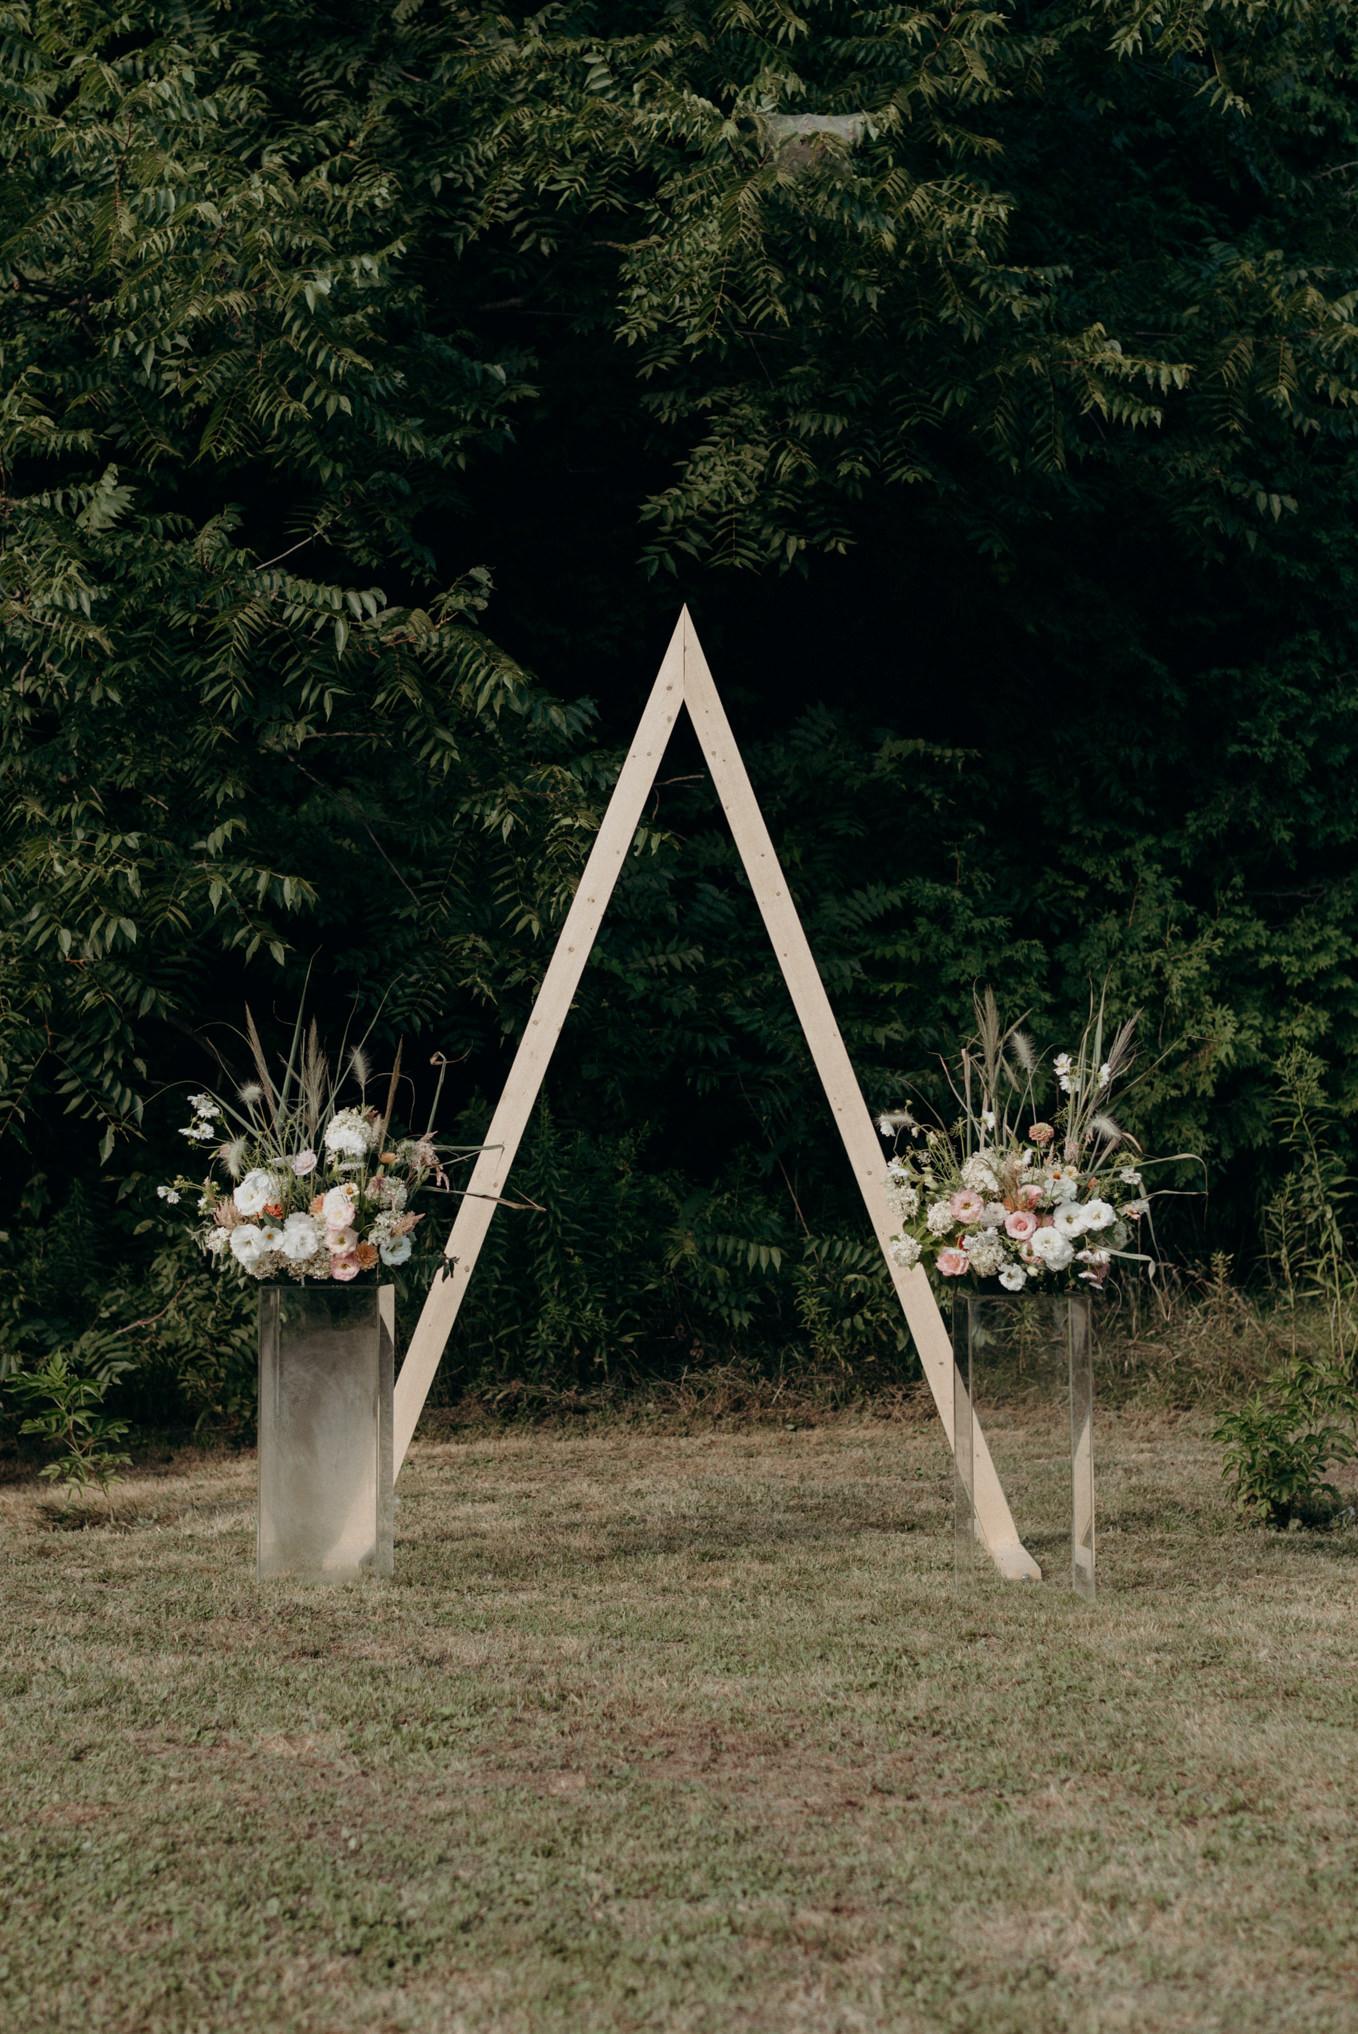 wood triangle ceremony backdrop diy